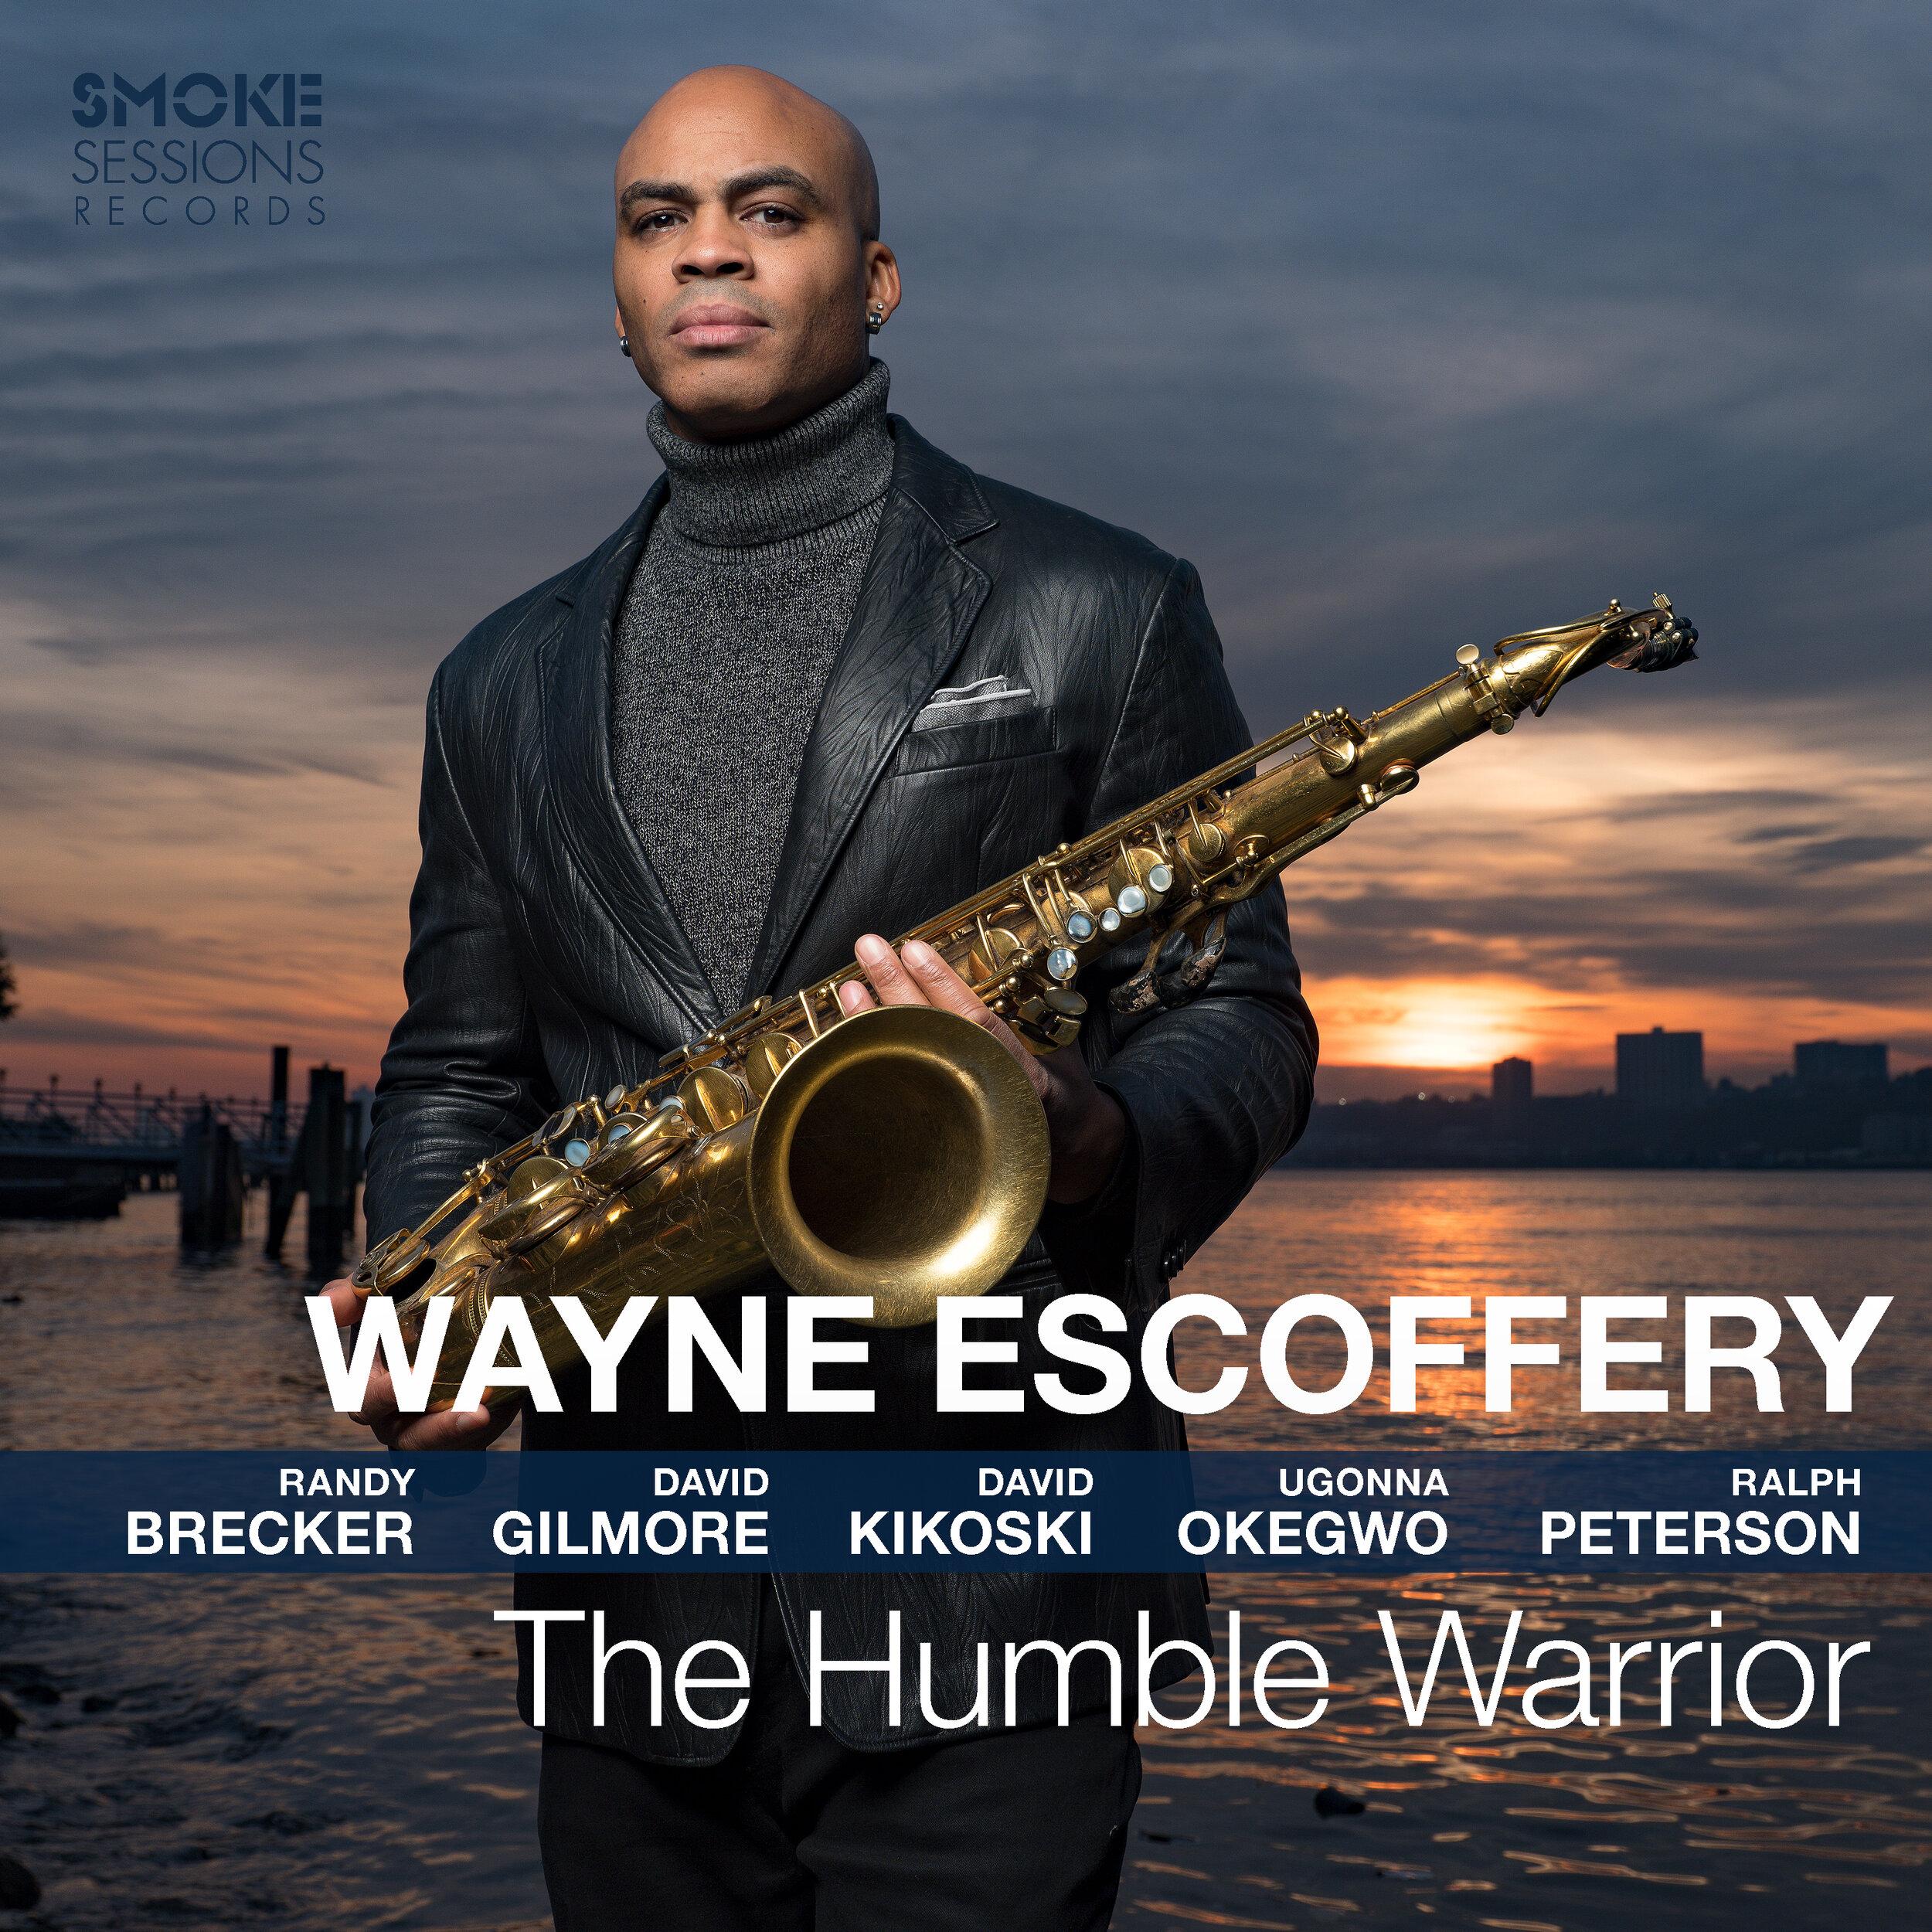 Wayne Escoffery wayneescoffery.com